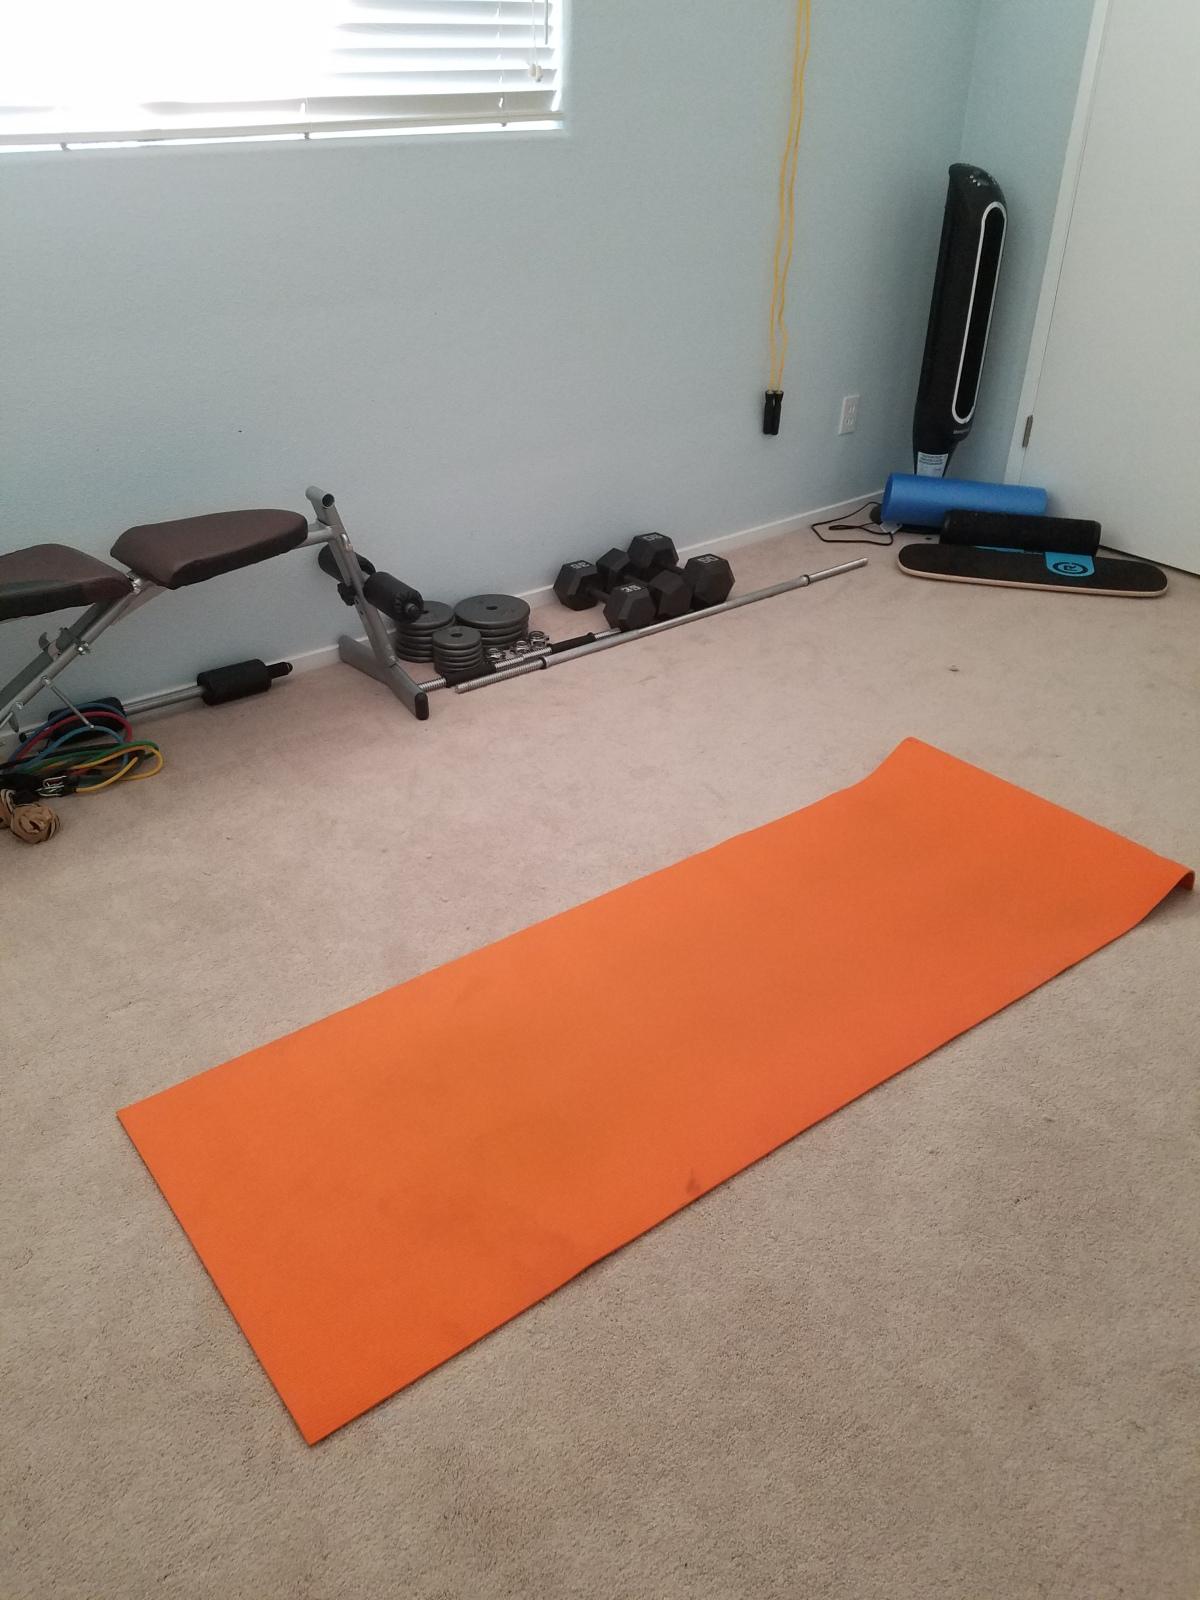 Two Weeks in-Beachbody Yoga 30Challenge